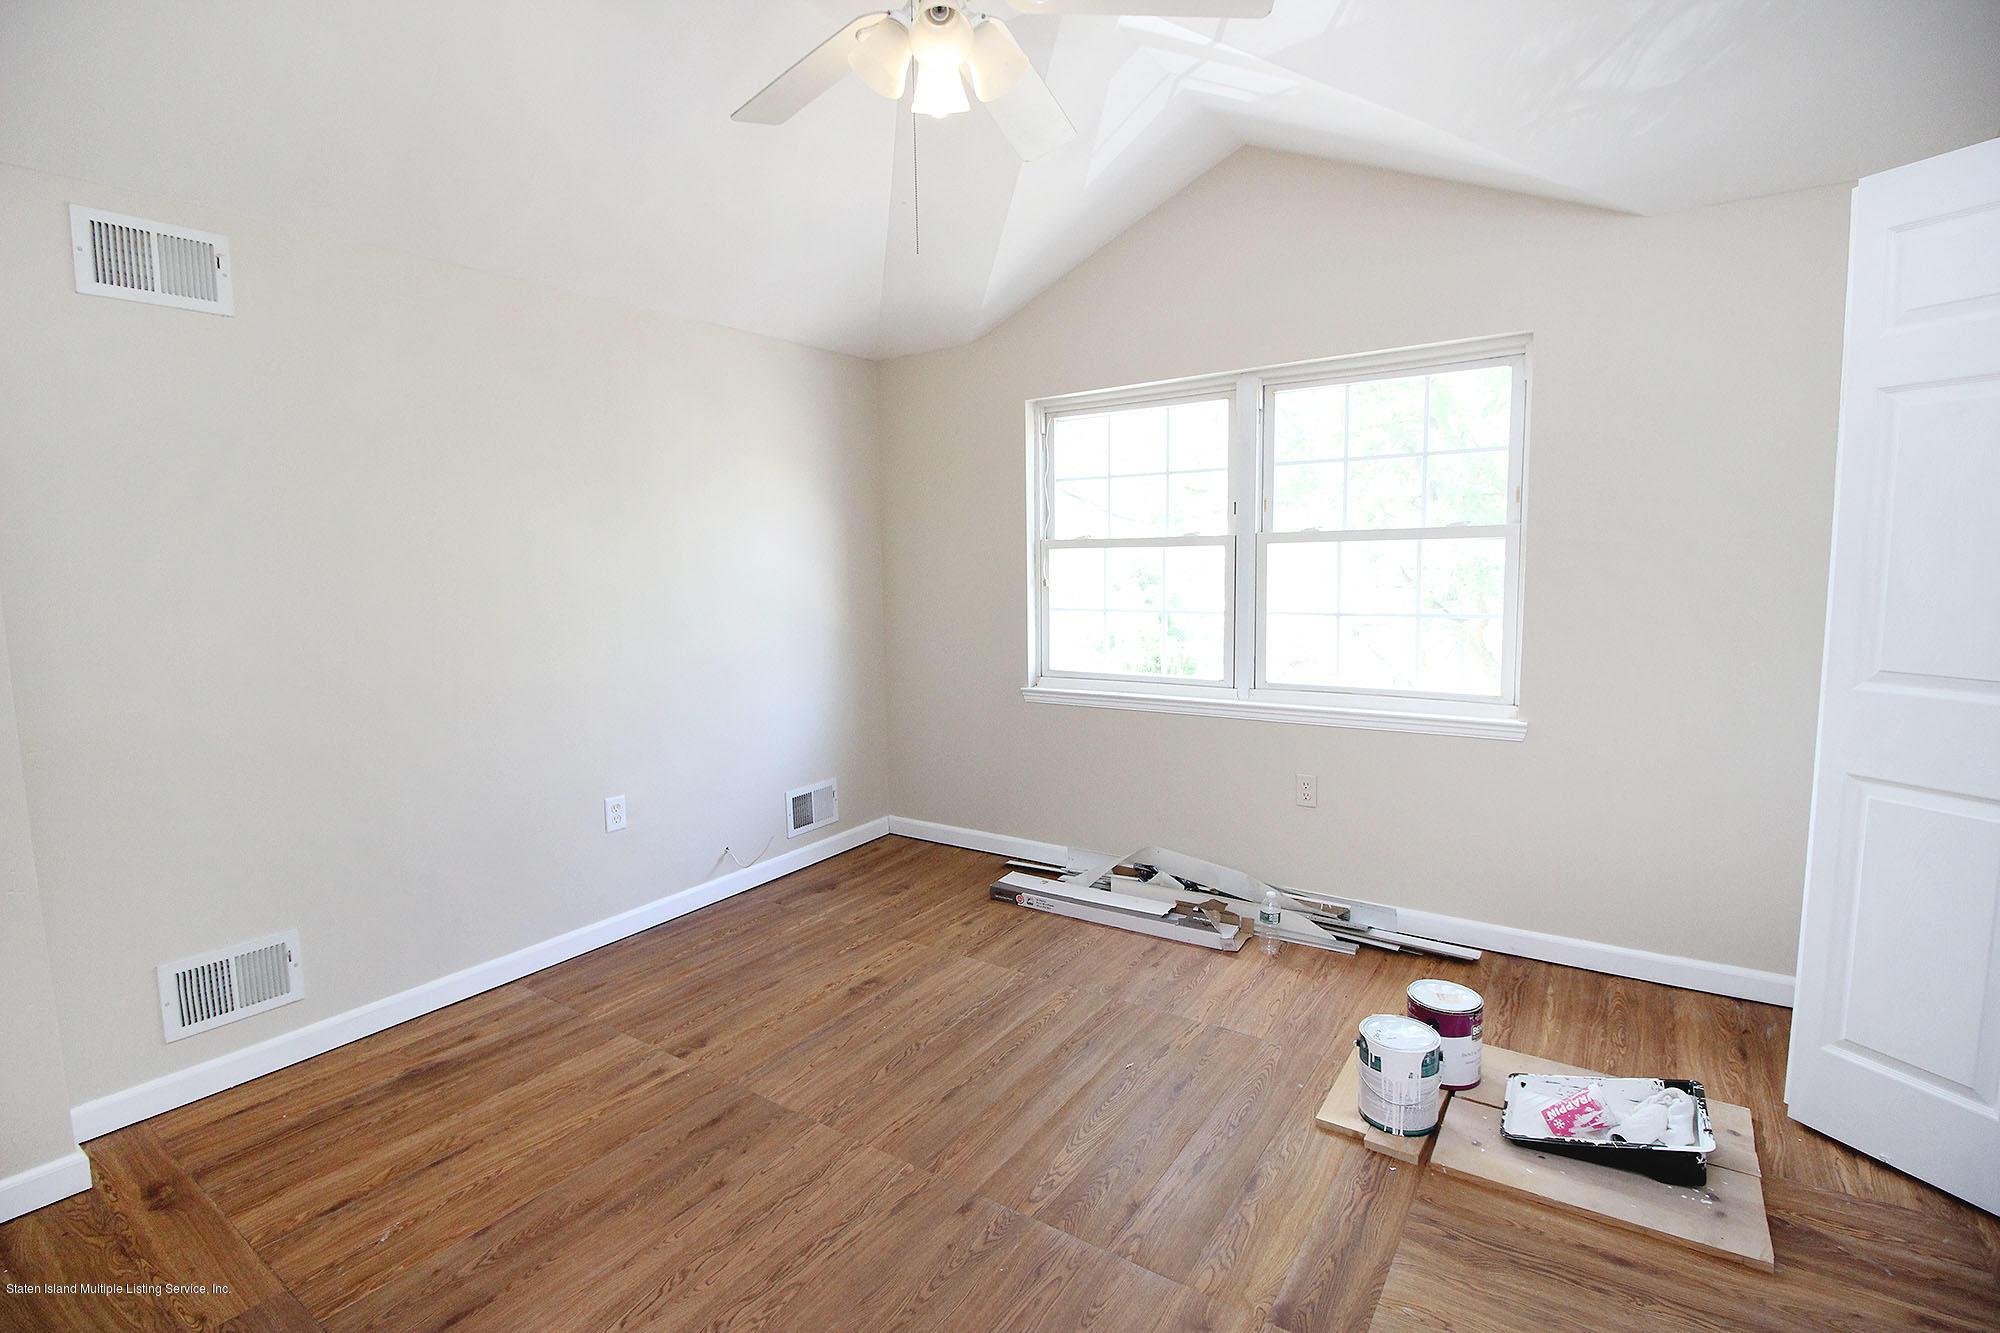 Single Family - Semi-Attached 230 Holden Boulevard  Staten Island, NY 10314, MLS-1139241-10